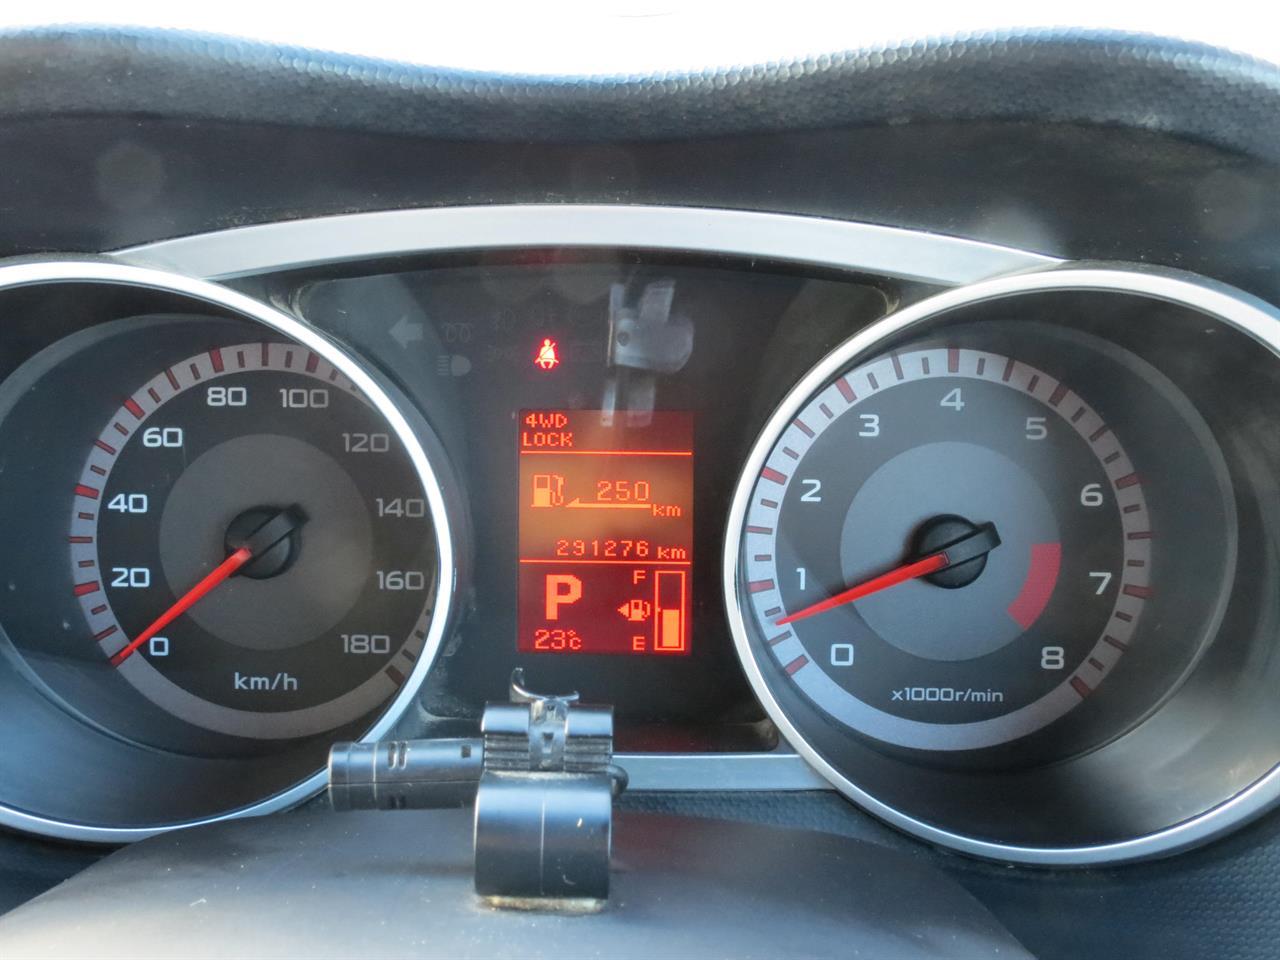 2006 Mitsubishi Outlander | only $20 weekly